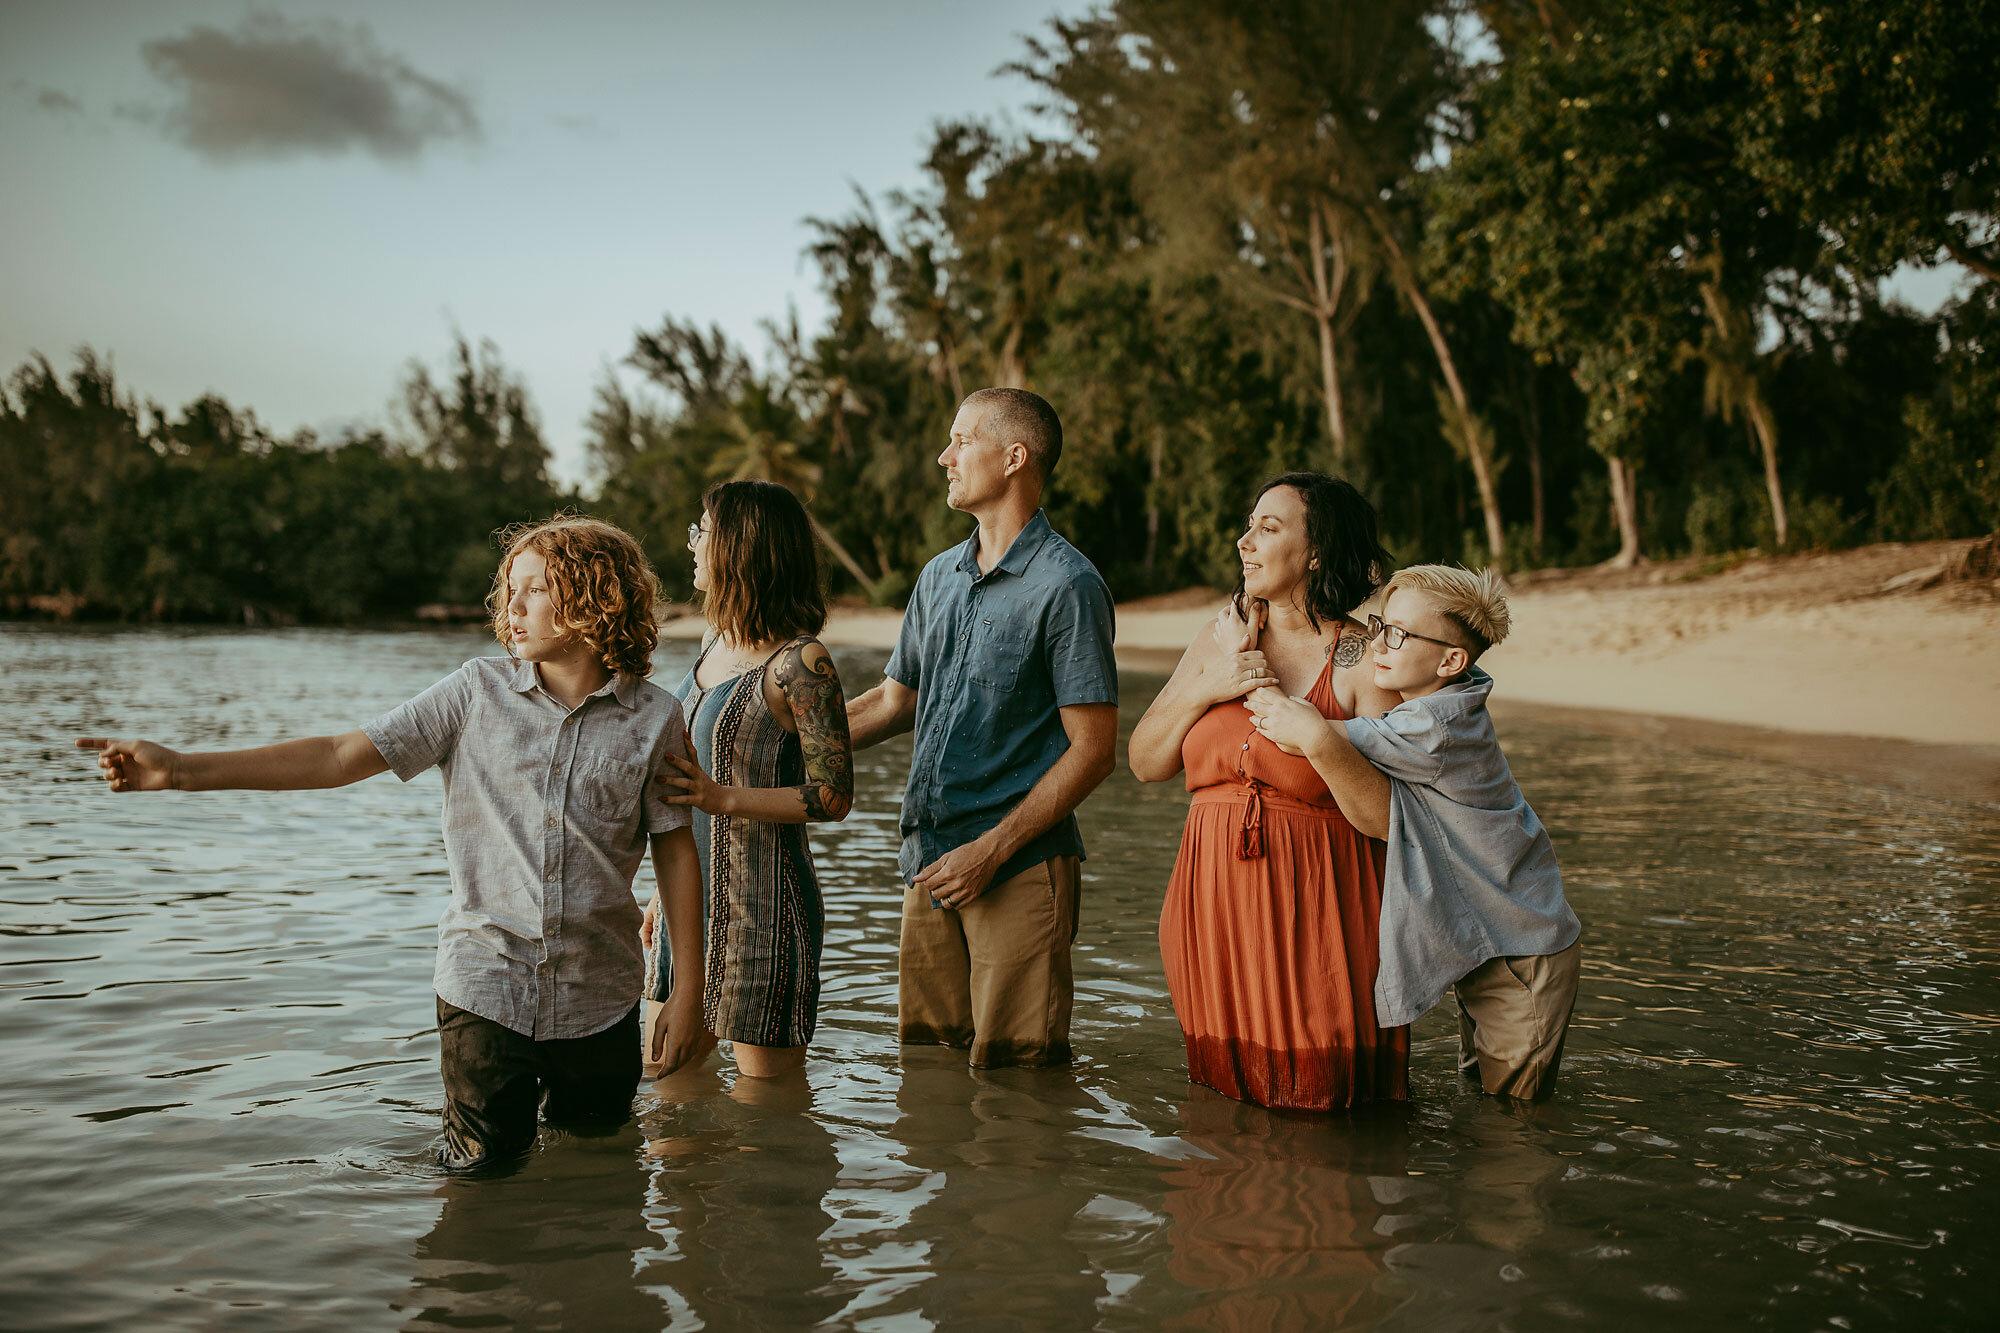 Oahu-Hawaii-Family-Photography-Family-Photos-16.jpg